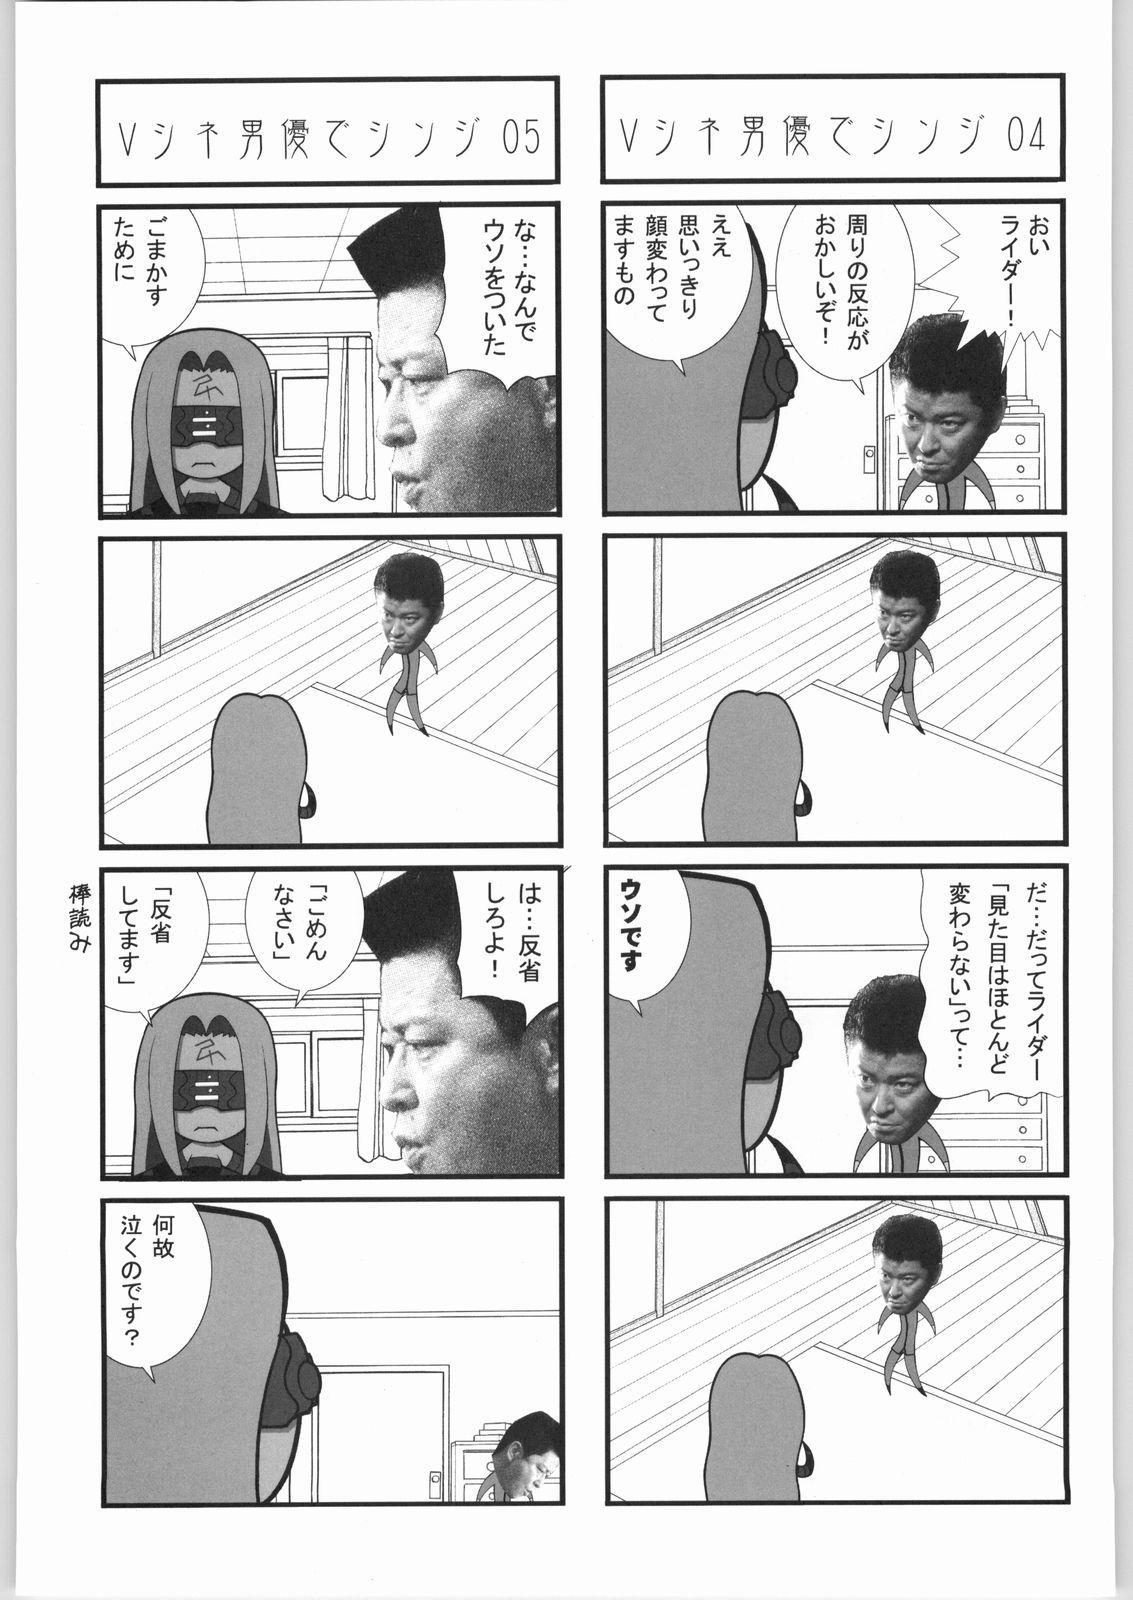 Kabushikigaisha Liver-Sashi 121